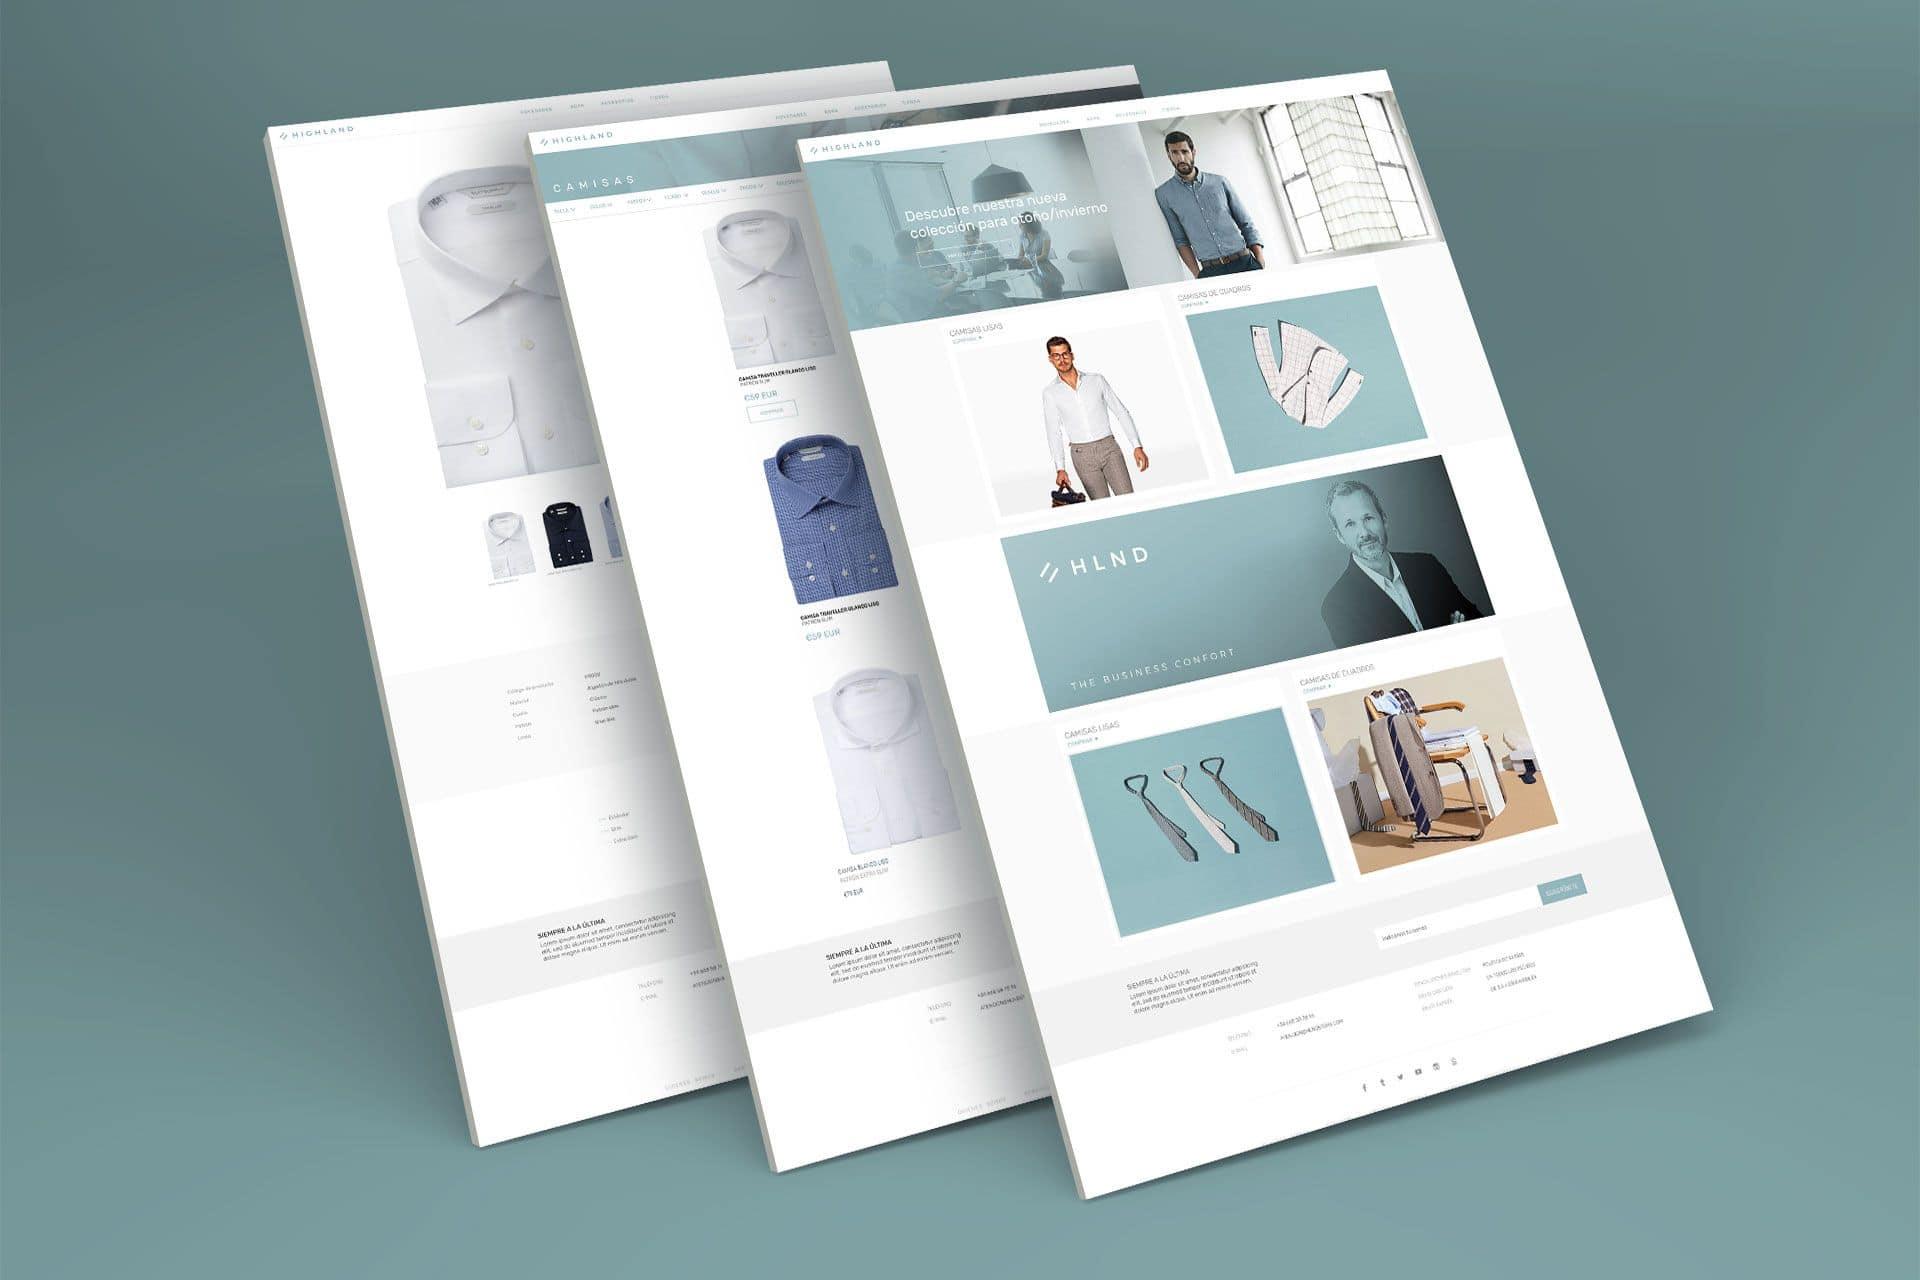 Aplicación imagen visual sobre web